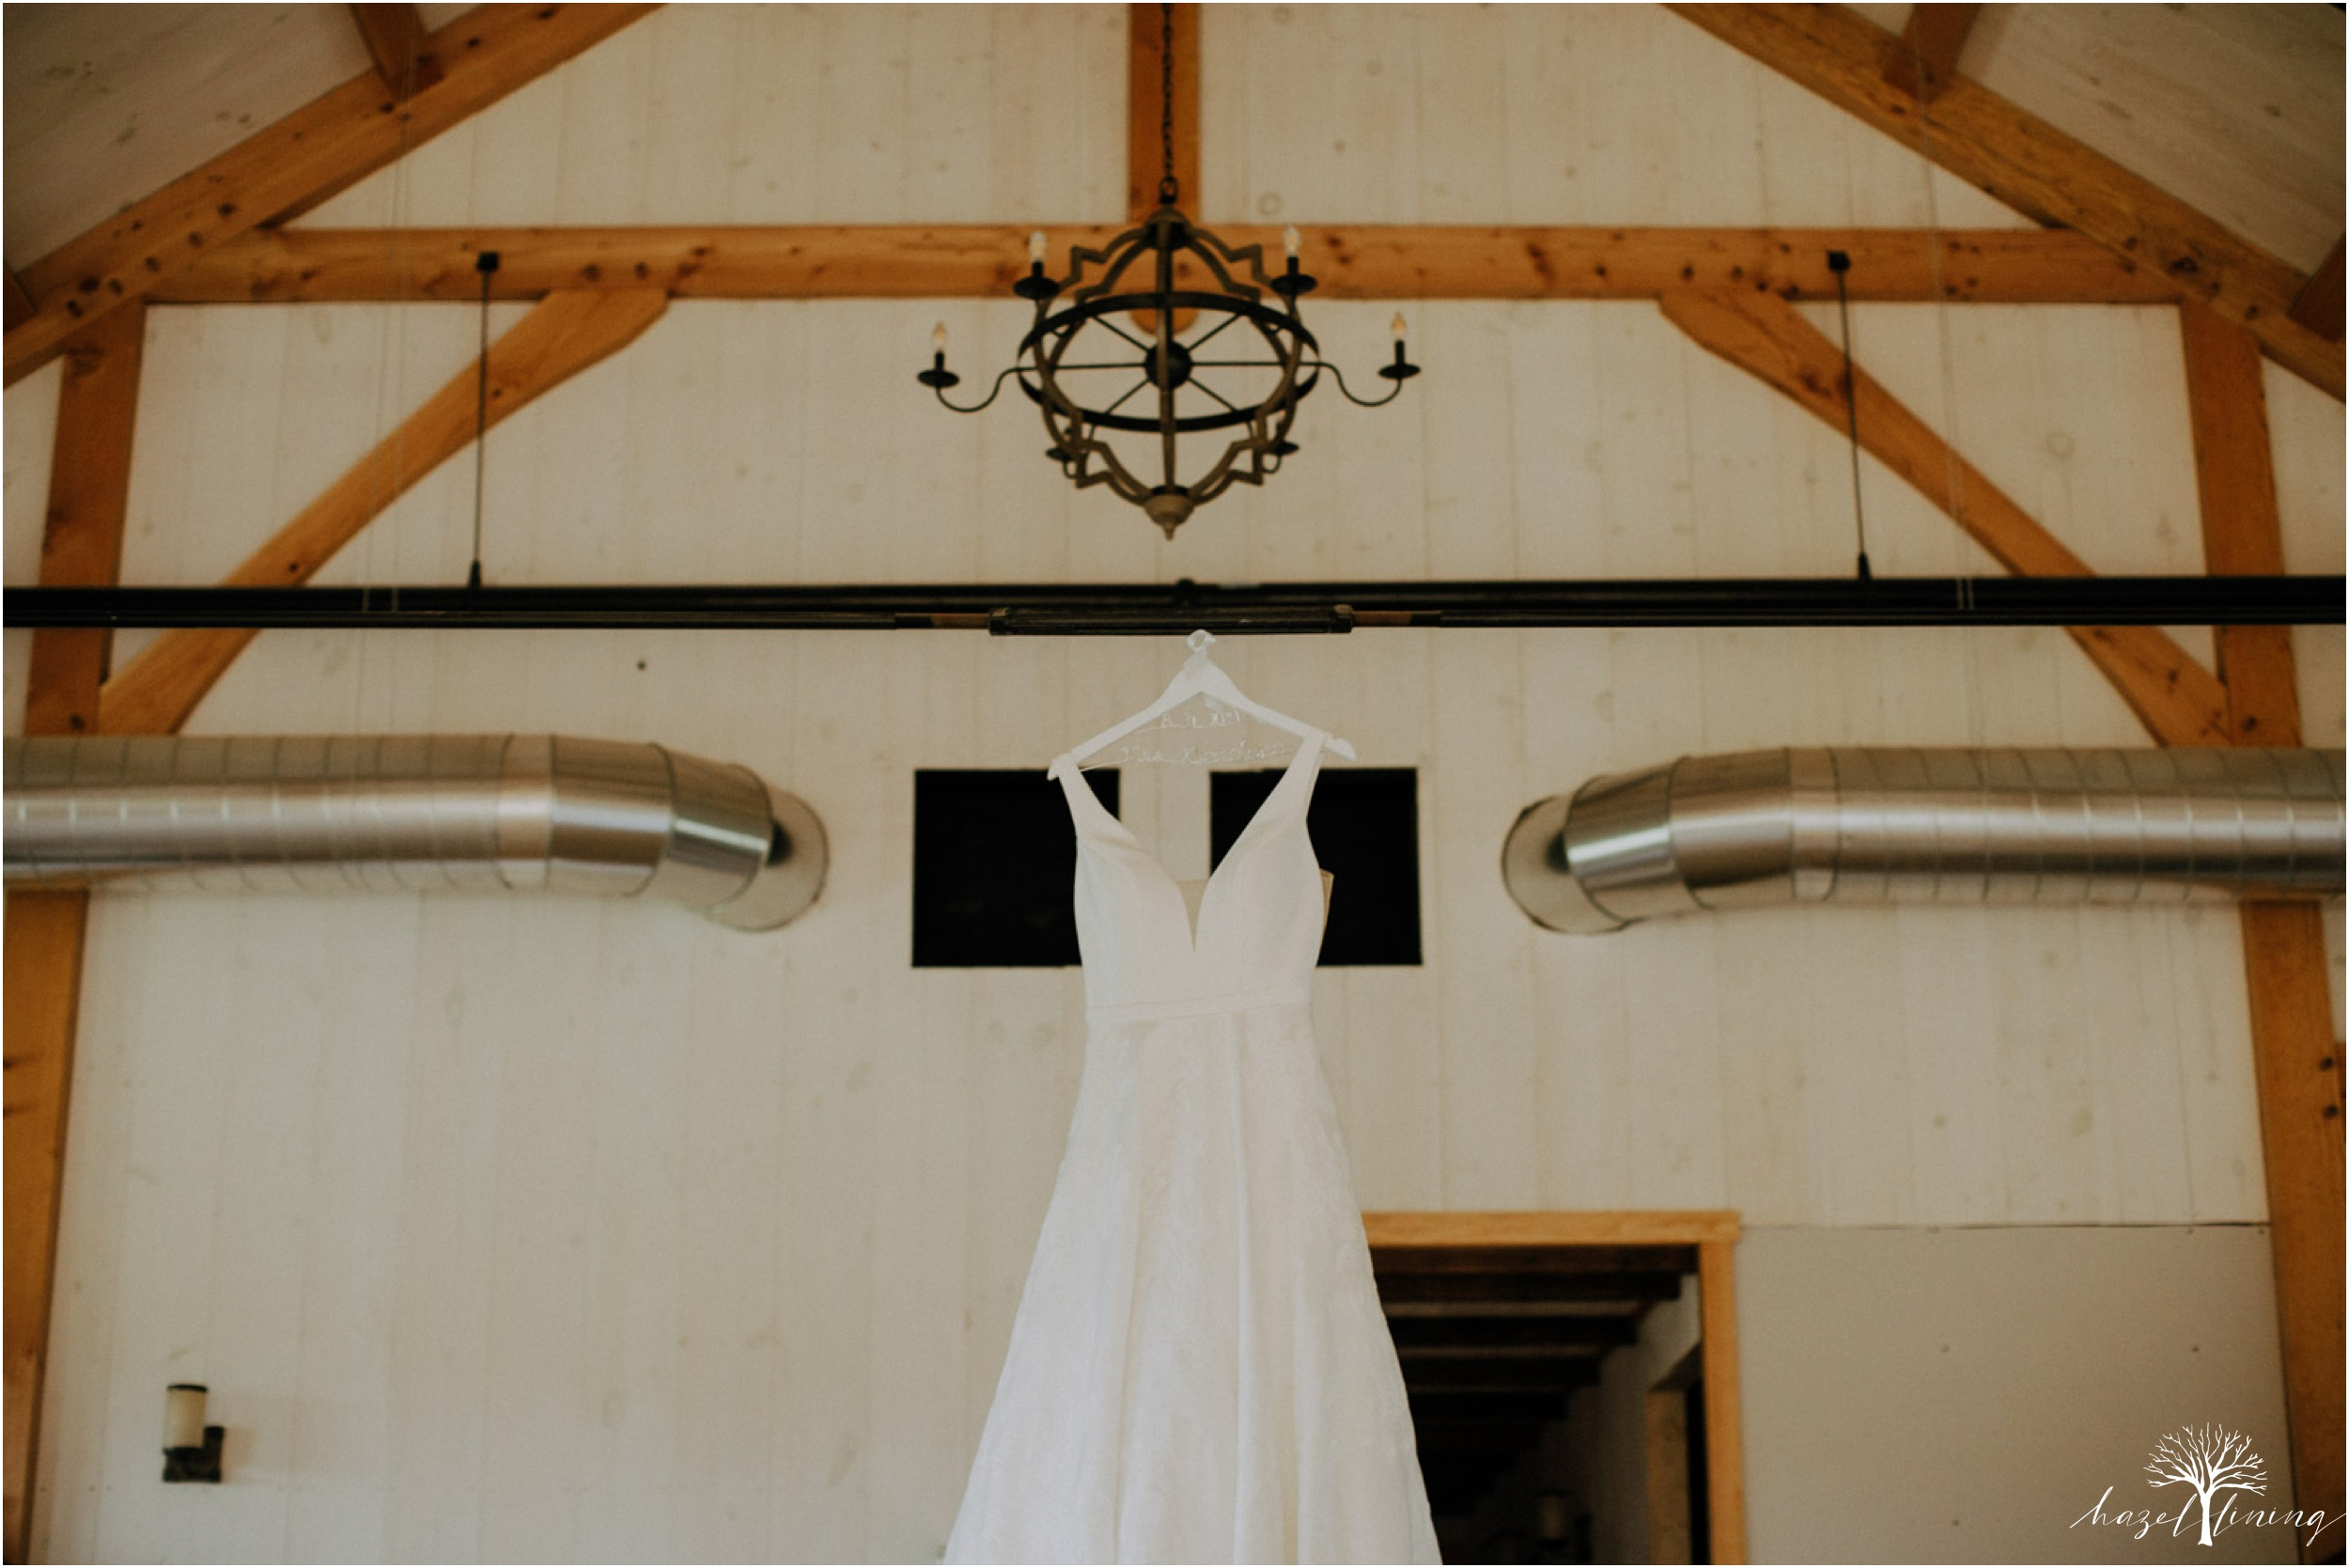 maureen-hepner-anthony-giordano-rose-bank-winery-newtow-pennsylvania-luxury-summer-wedding-hazel-lining-photography-destination-elopement-wedding-engagement-photography_0011.jpg